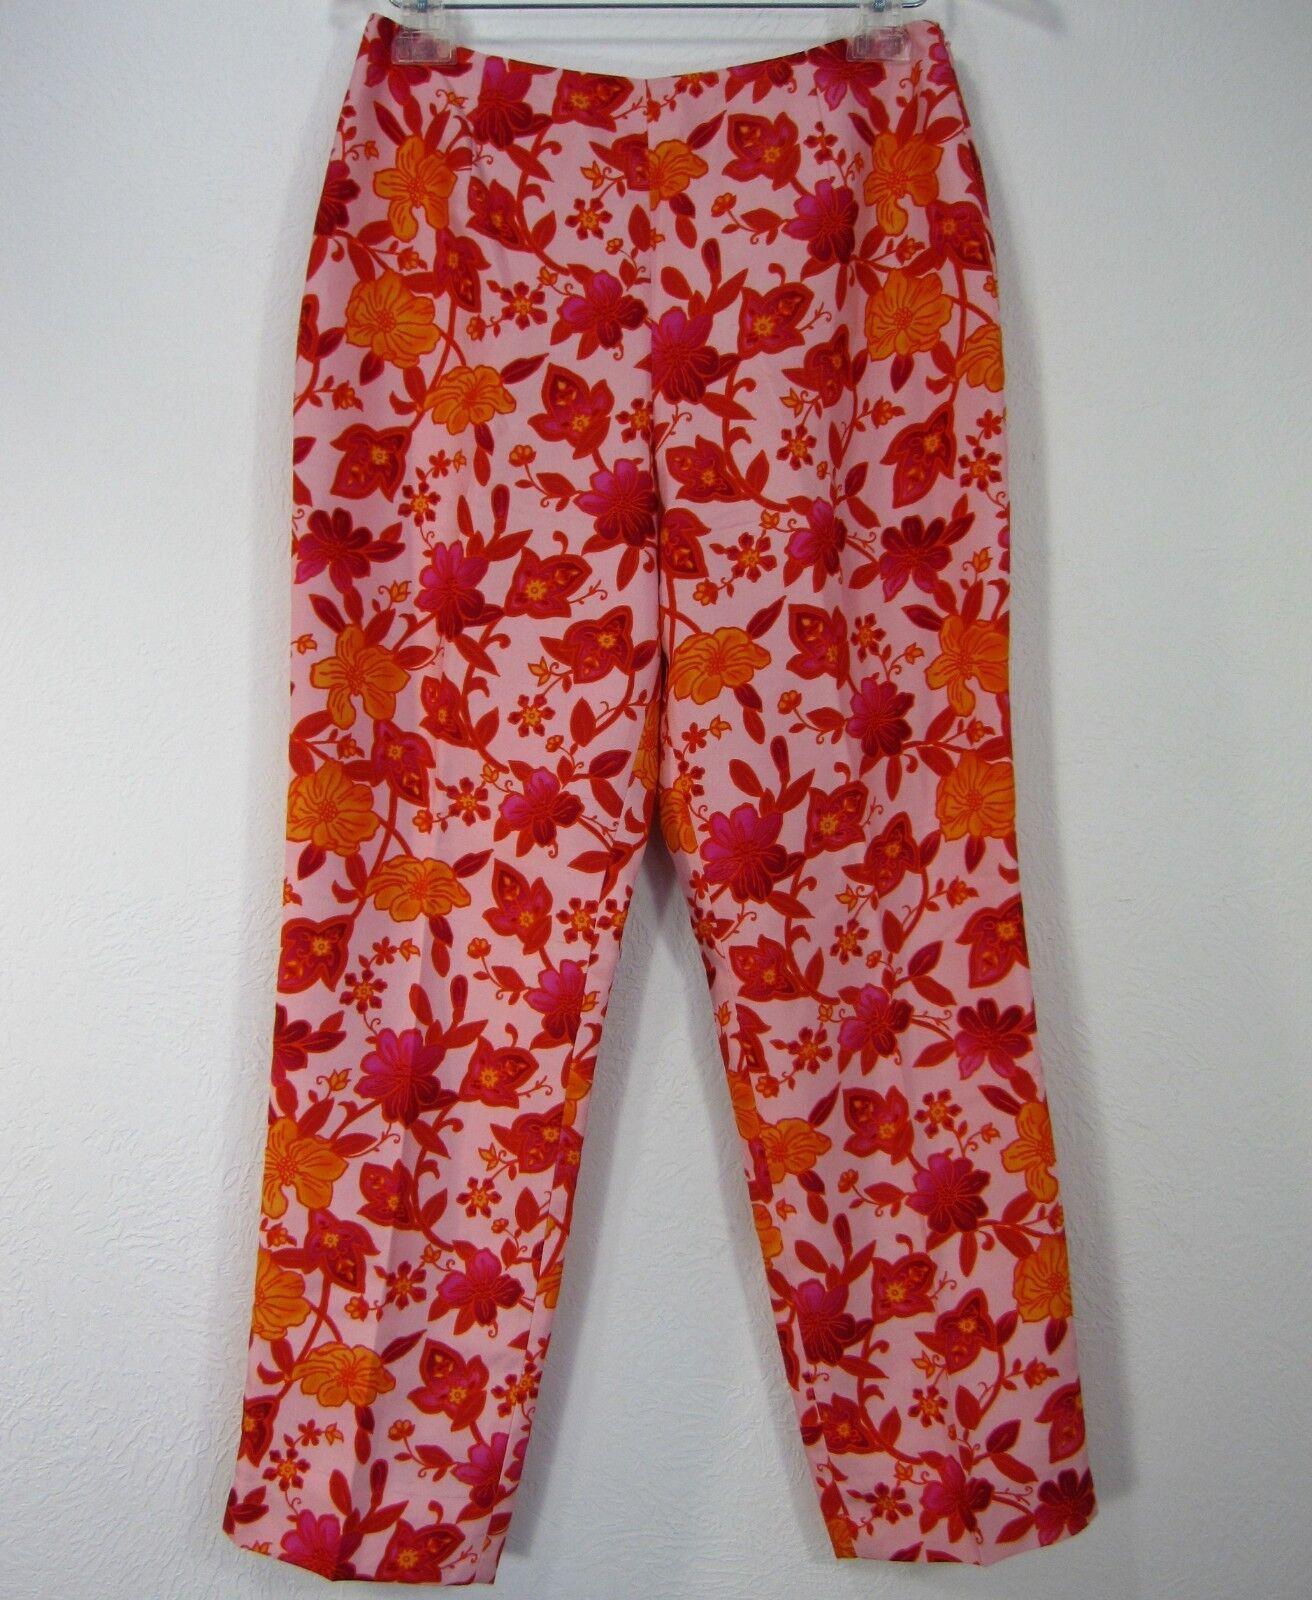 ANN TAYLOR 100% SILK PANTS SIZE 6 Red orange Floral